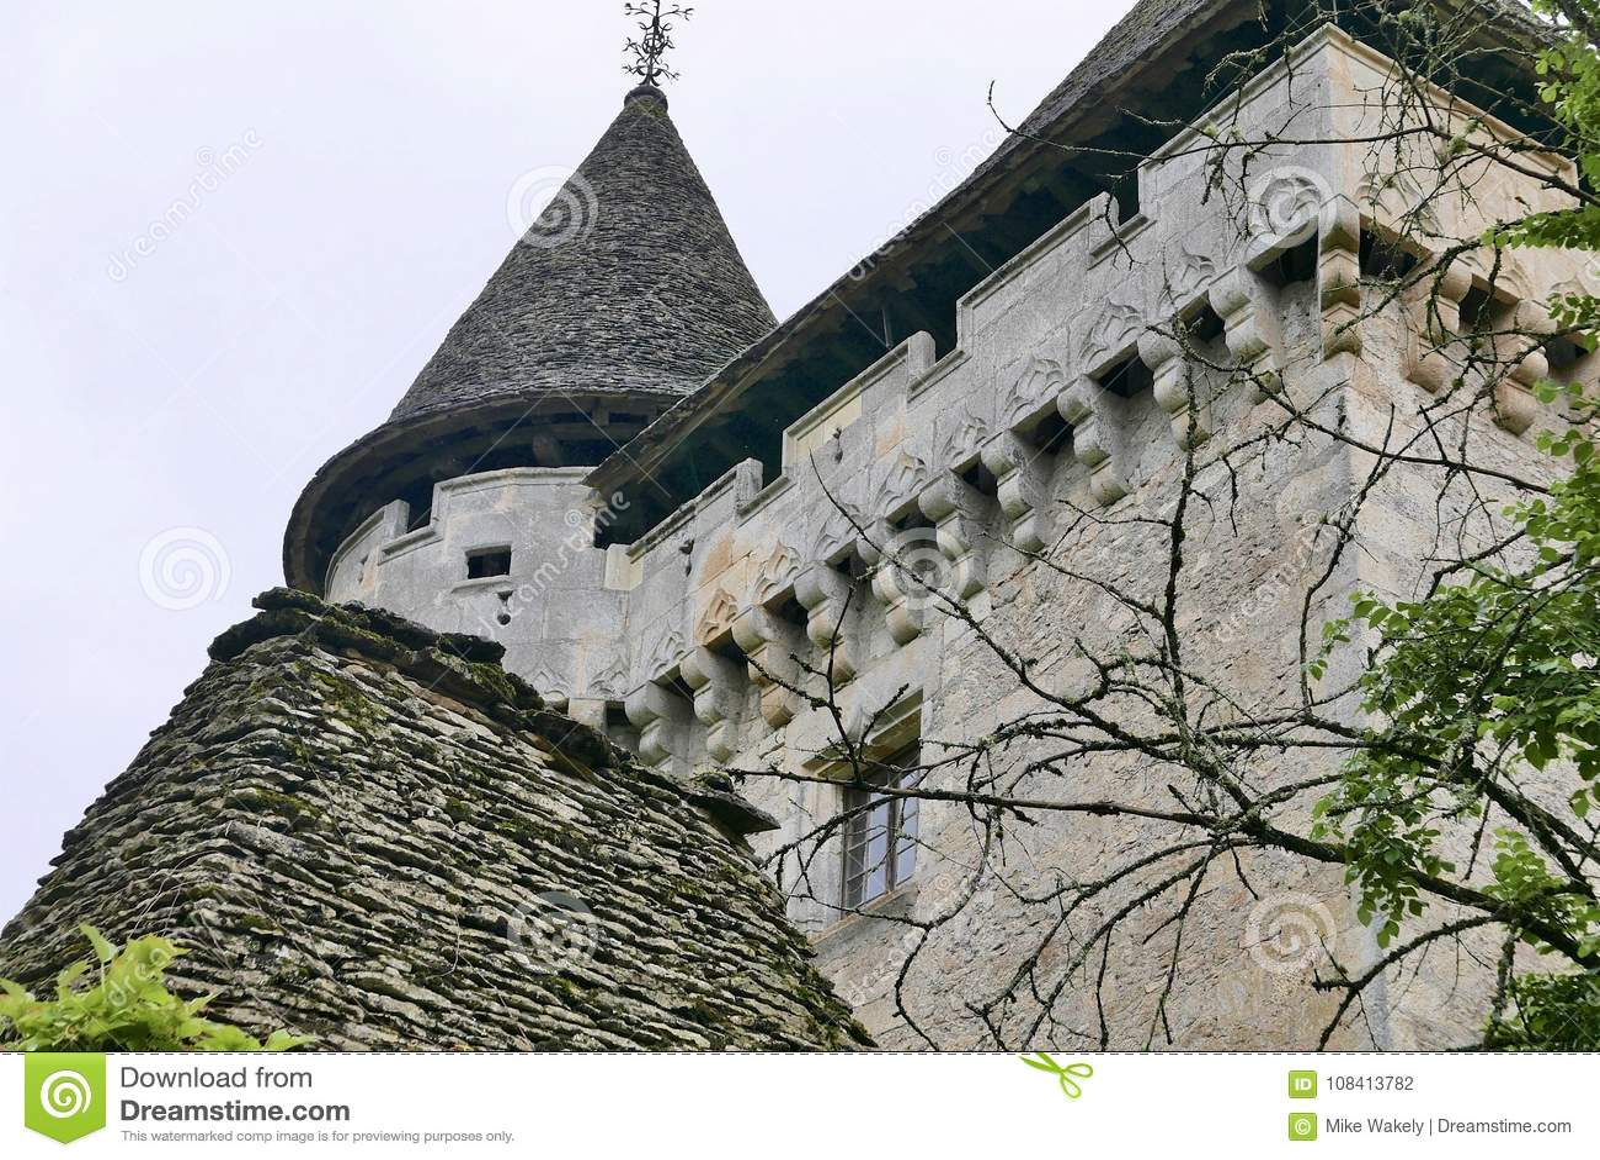 Chateau de Losse på Thonac i Dordognen